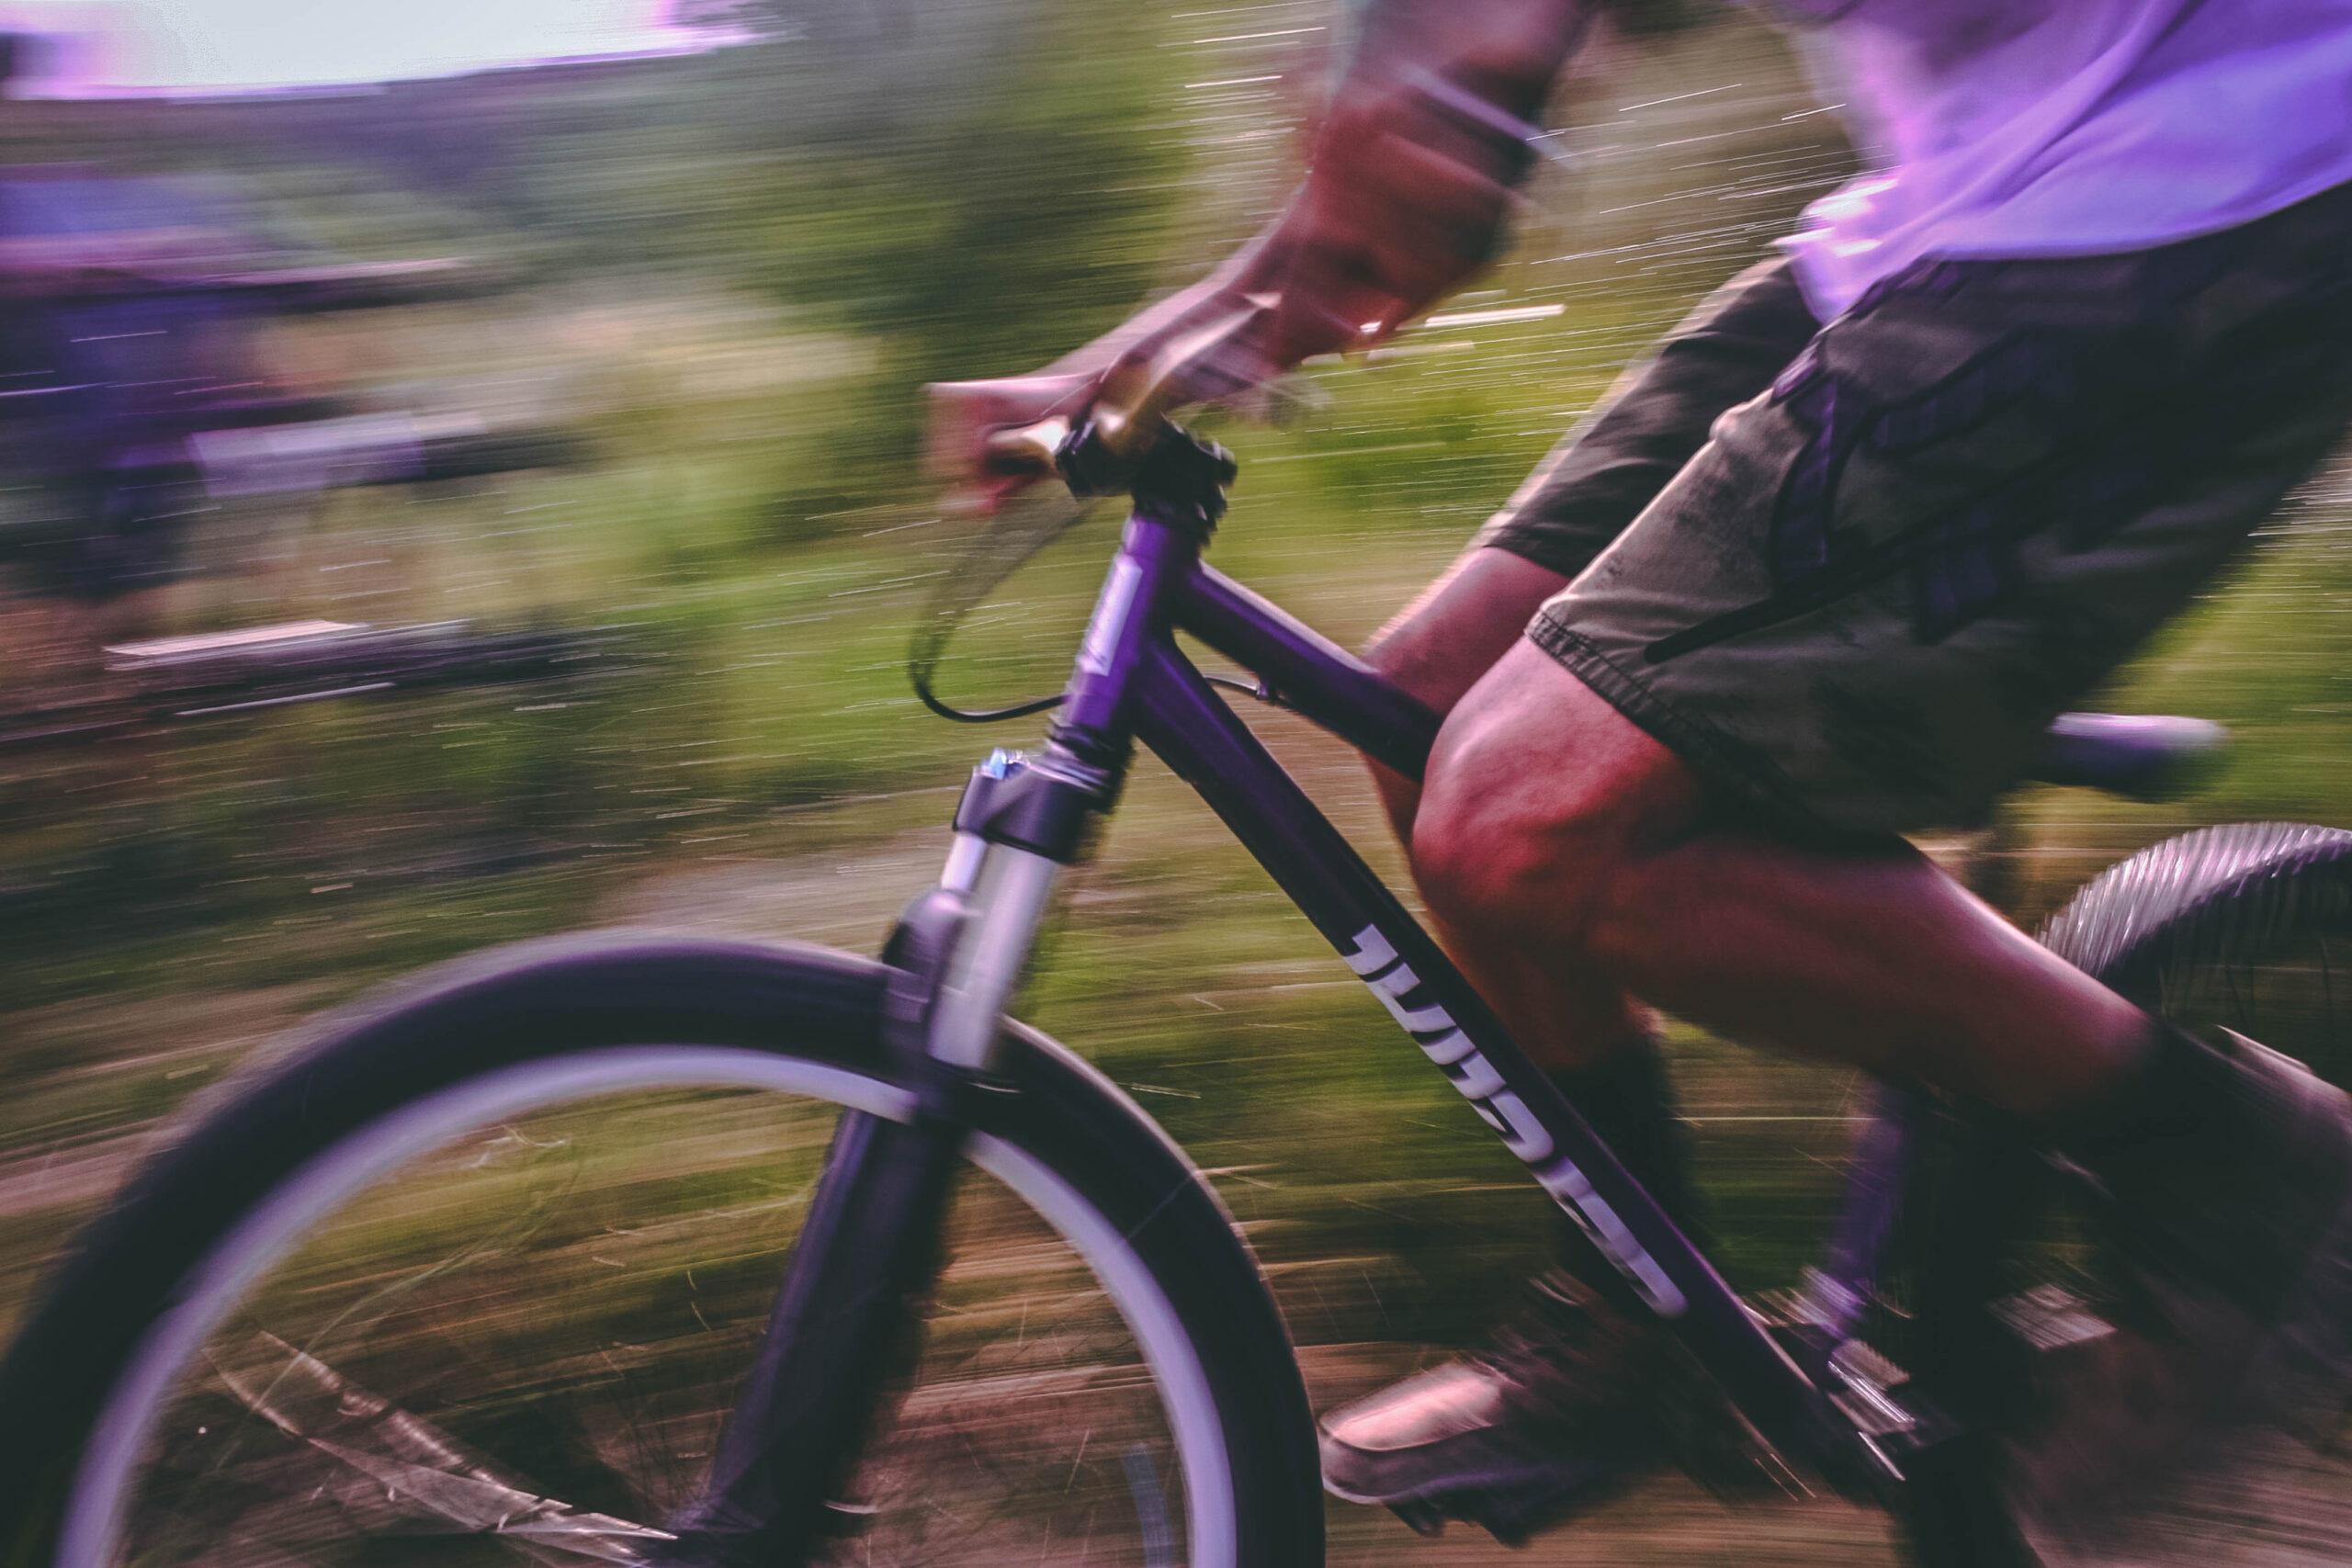 Image of guy riding bike in grassland